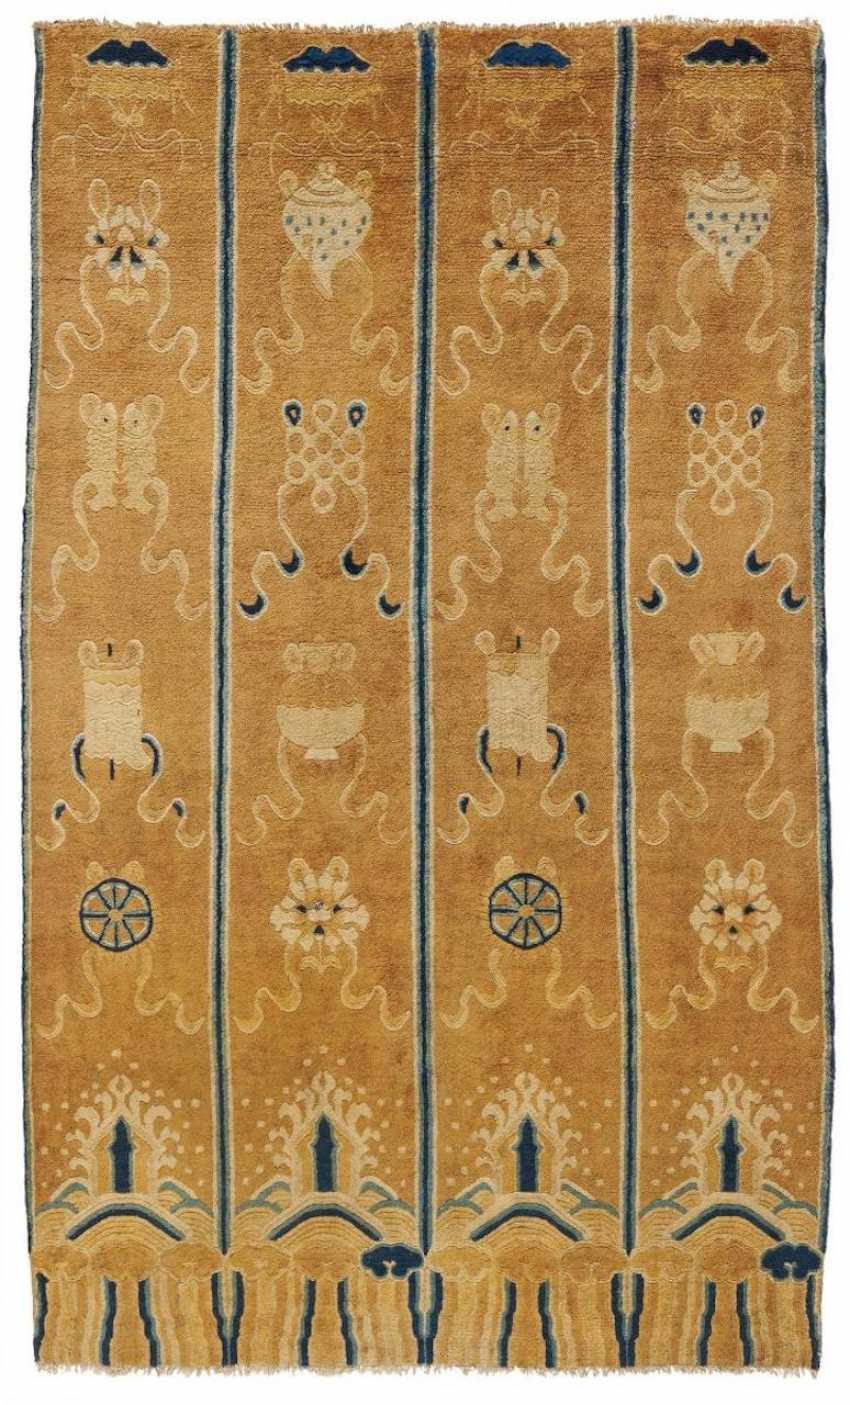 Rare pillar carpet with the Eight Buddhist treasures - photo 1